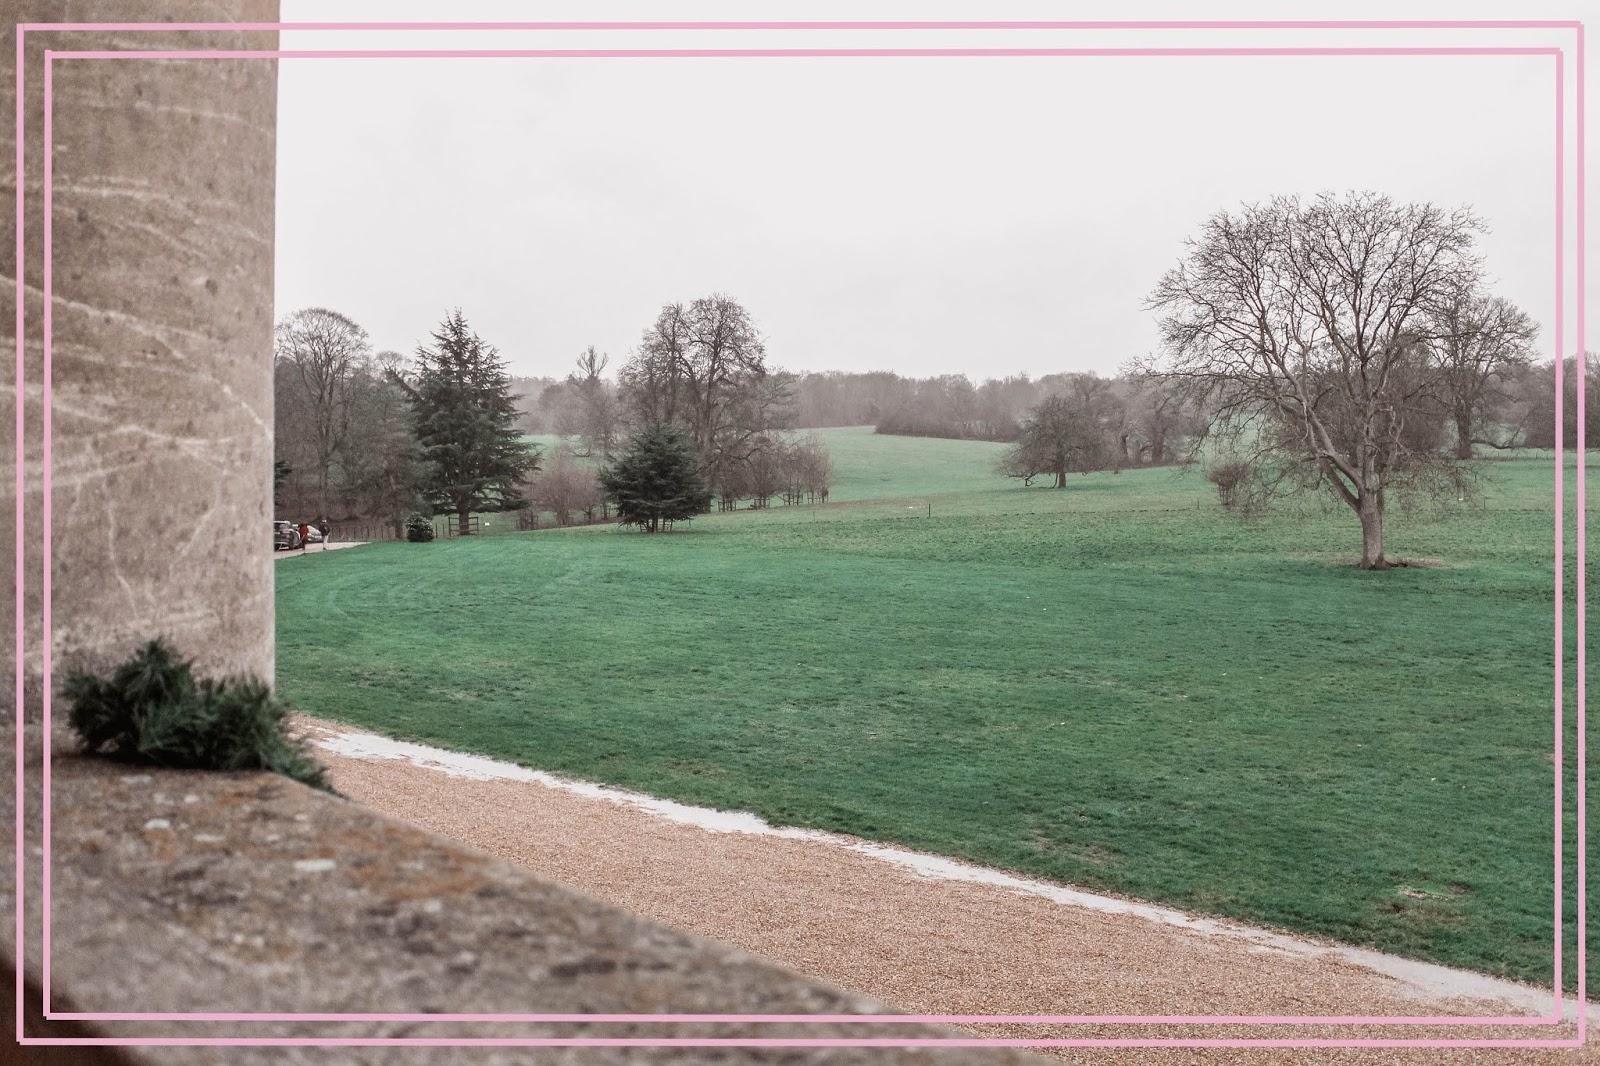 Luxury Countryside Manor Grounds England